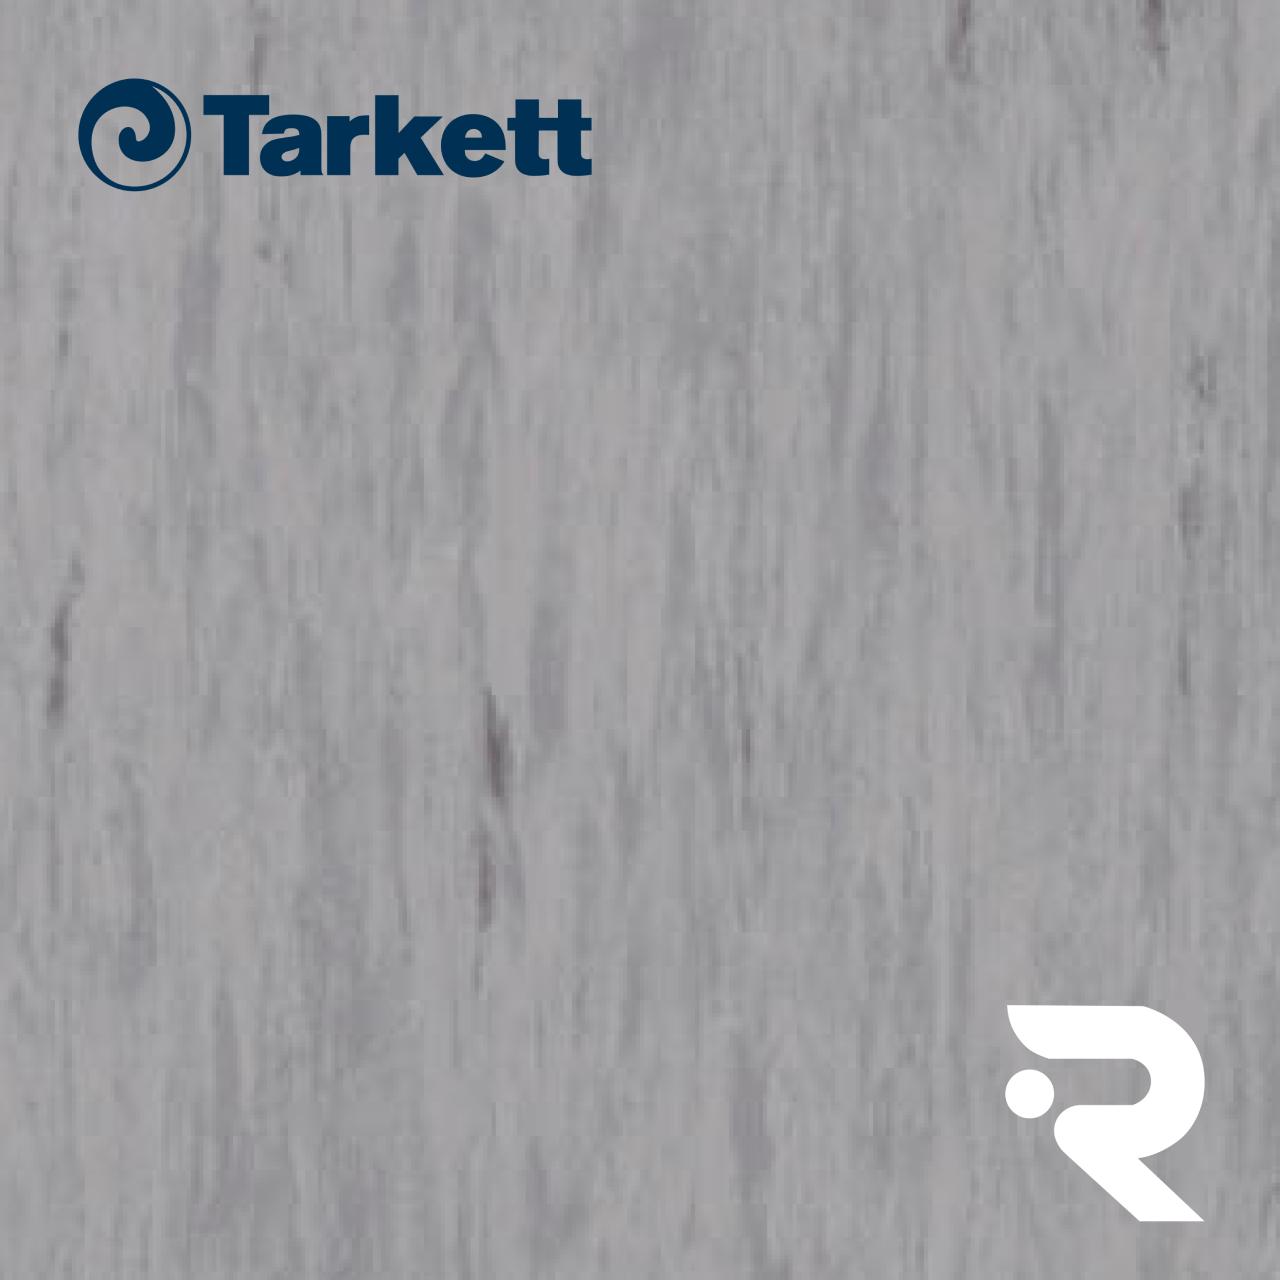 🏫 Гомогенный линолеум Tarkett | Standard GREY 0498 | Standard Plus 2.0 mm | 2 х 23 м